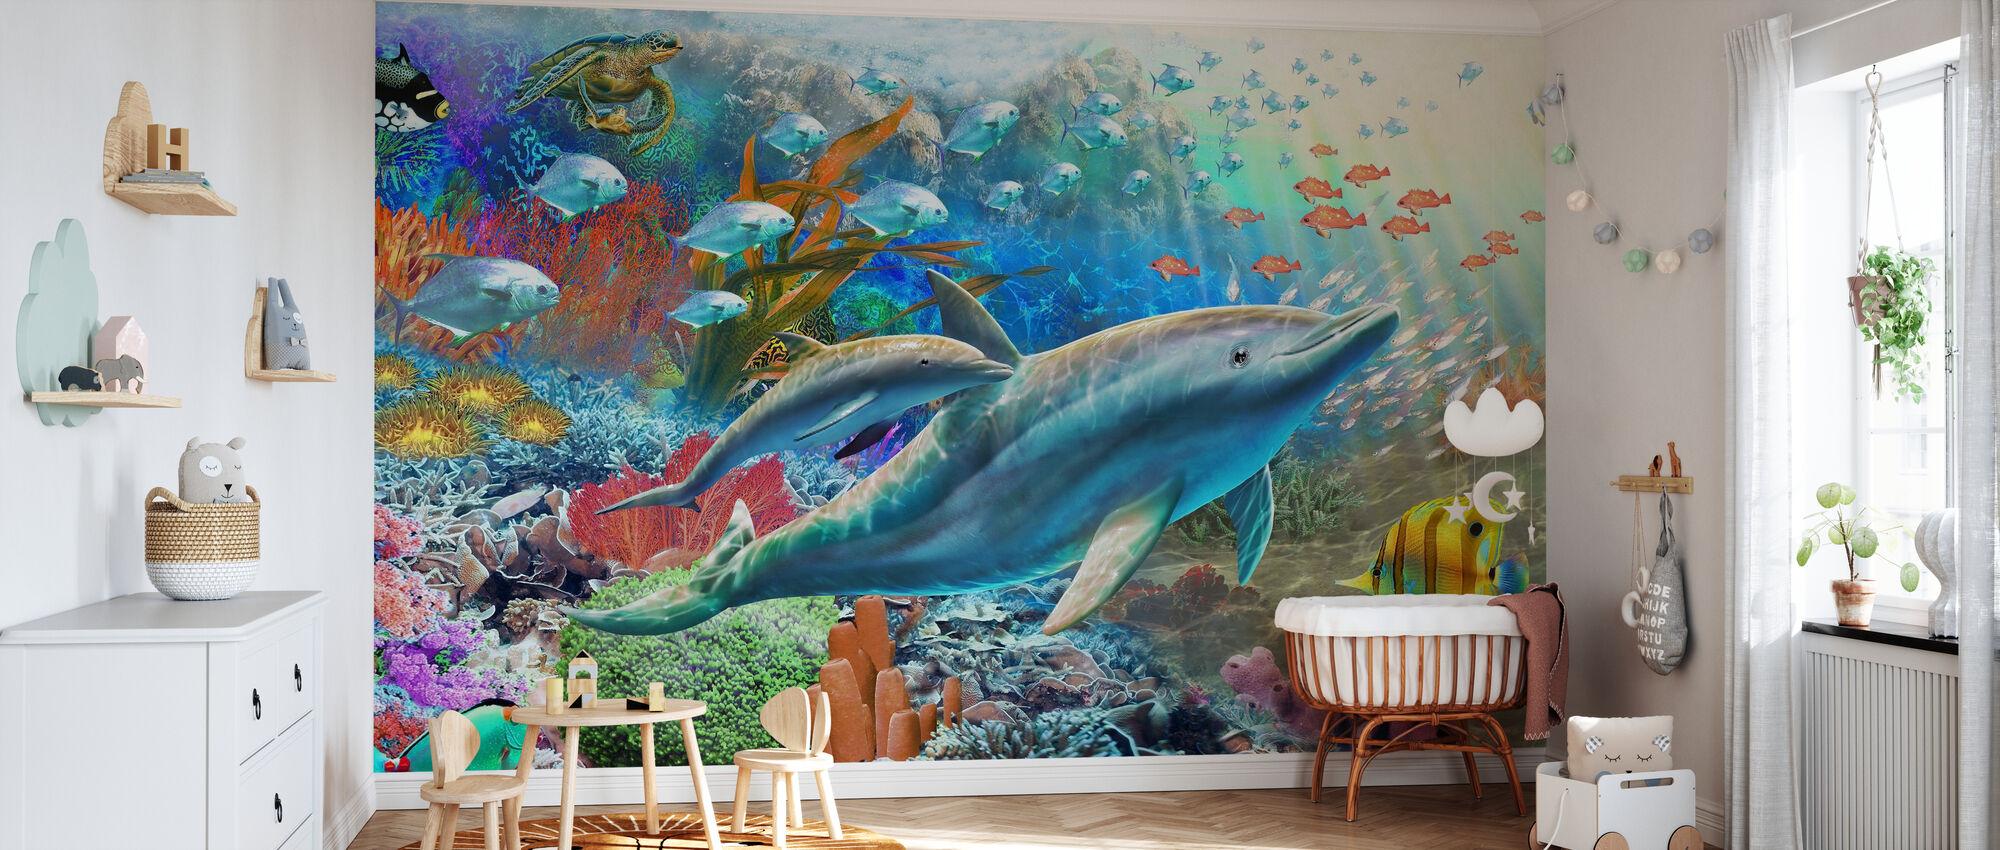 Land and Water Utopia I - Wallpaper - Nursery